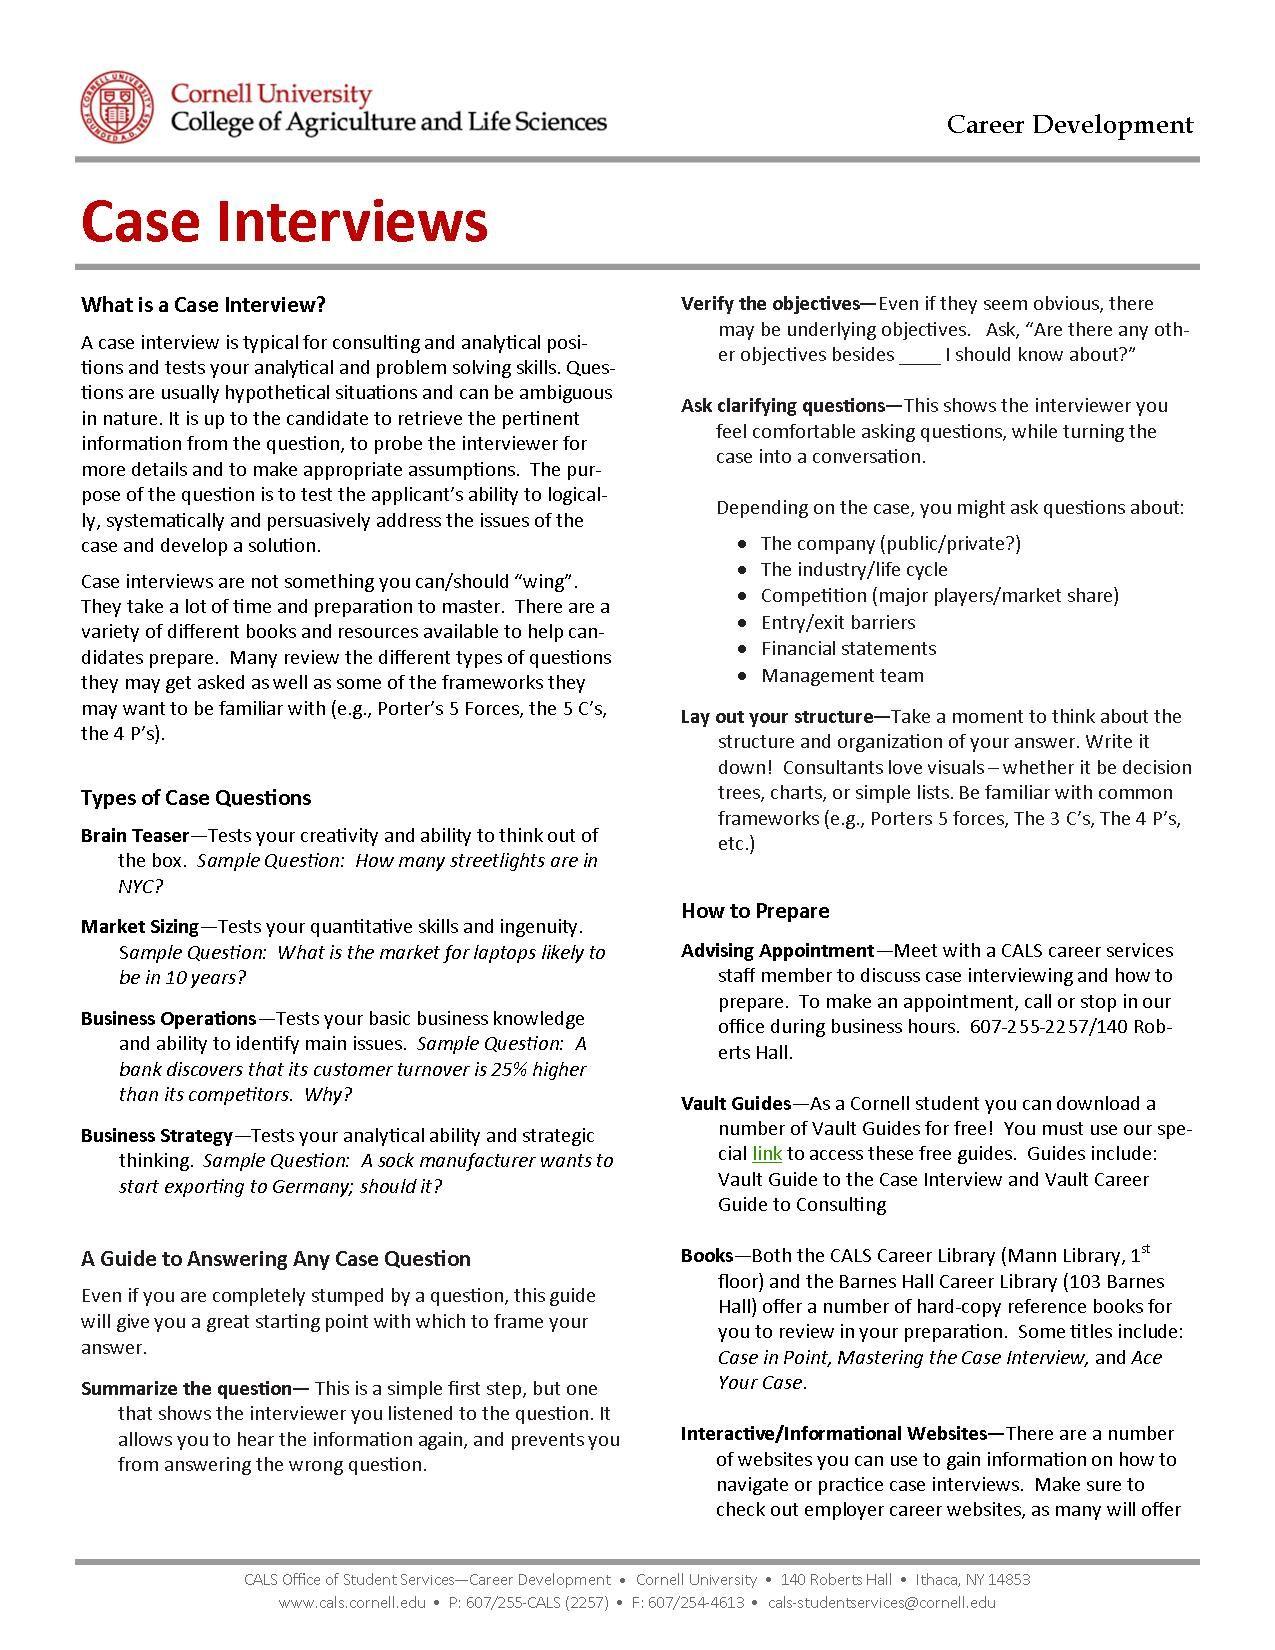 case interviewing